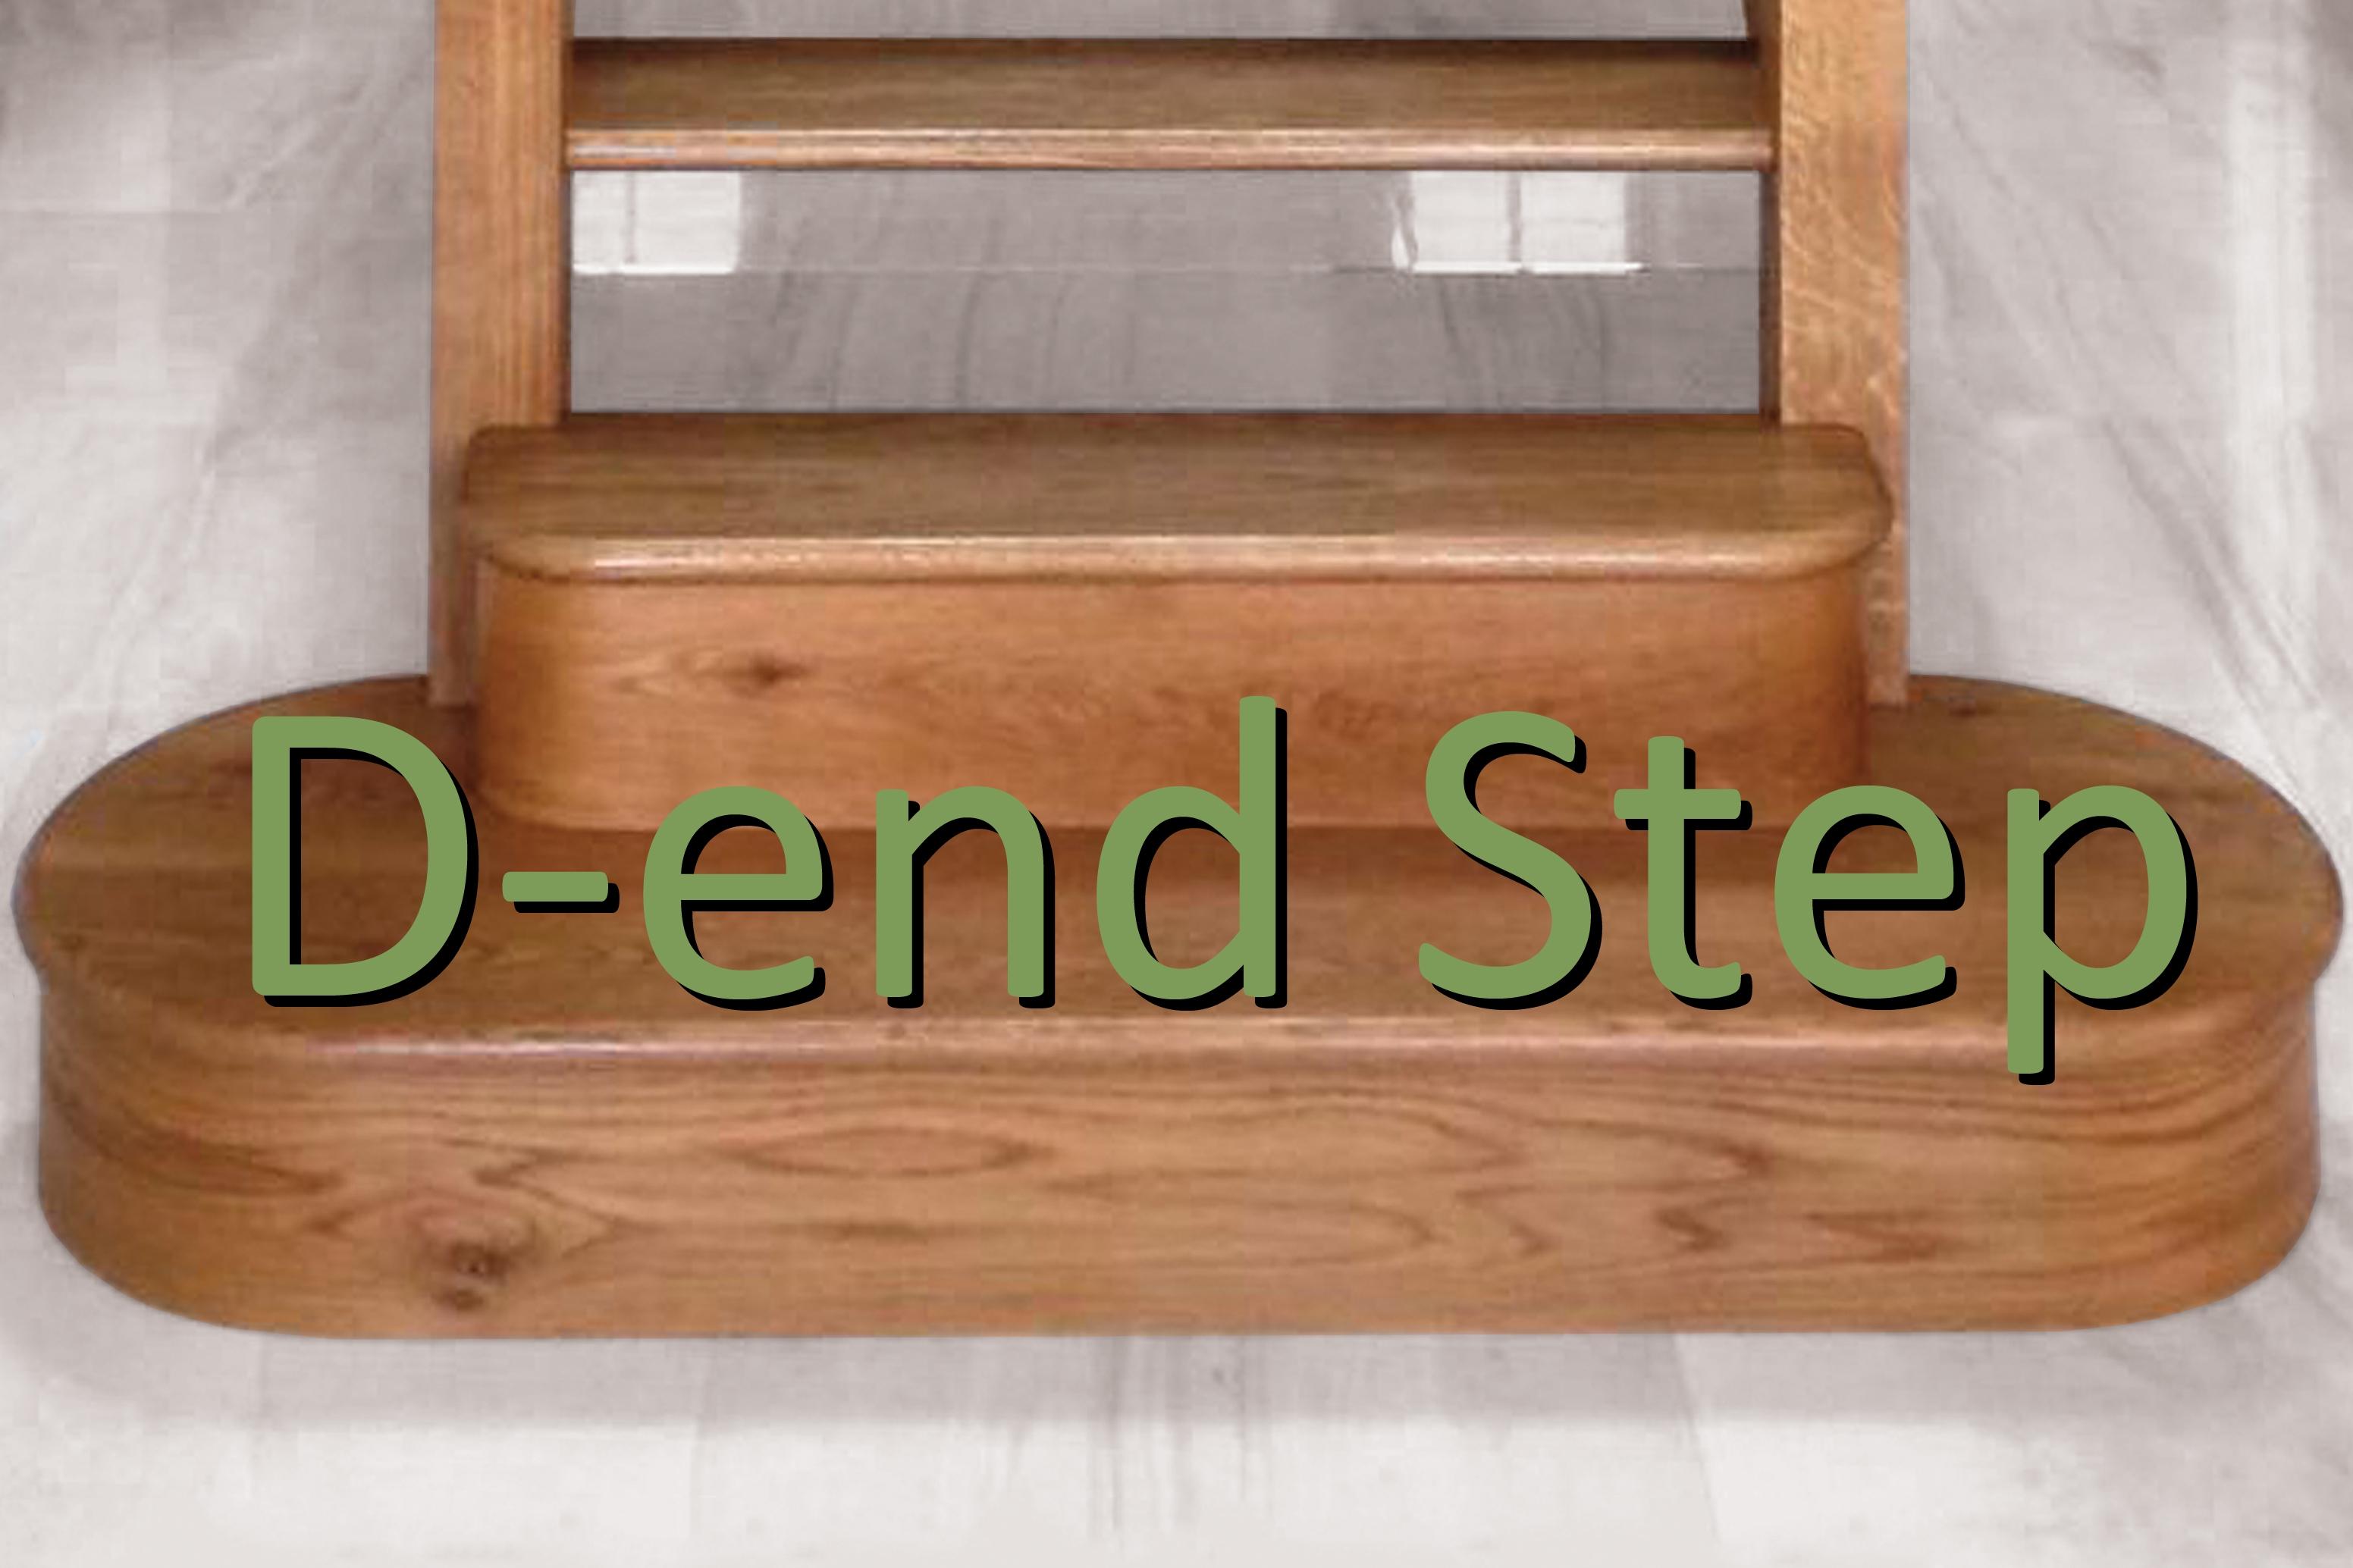 D-end step